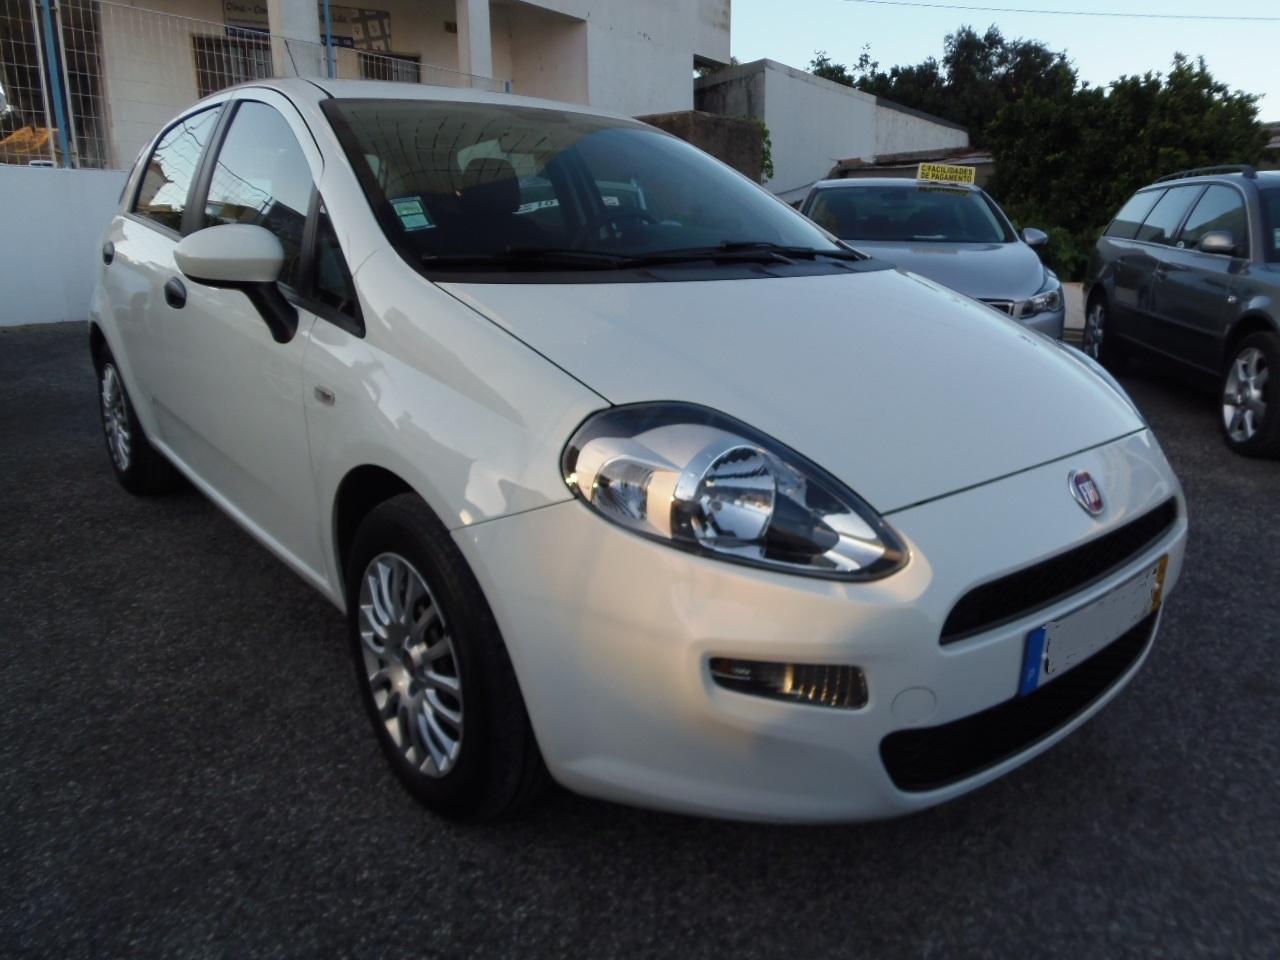 Fiat Punto 1.3 M-Jet 4 Fleet